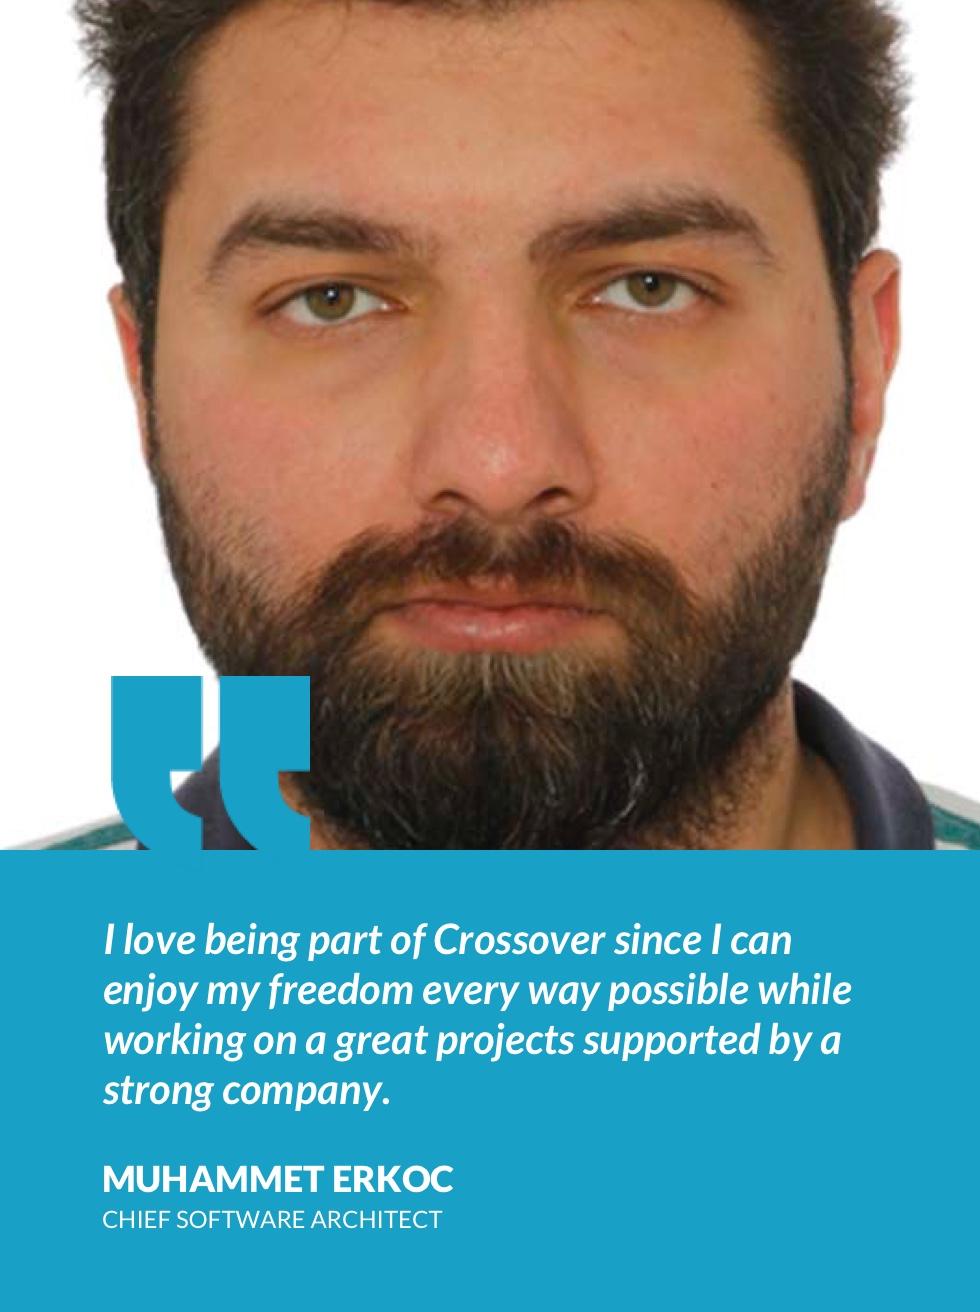 S_Chief Software Architect_Muhammet Erkoc_B.jpg